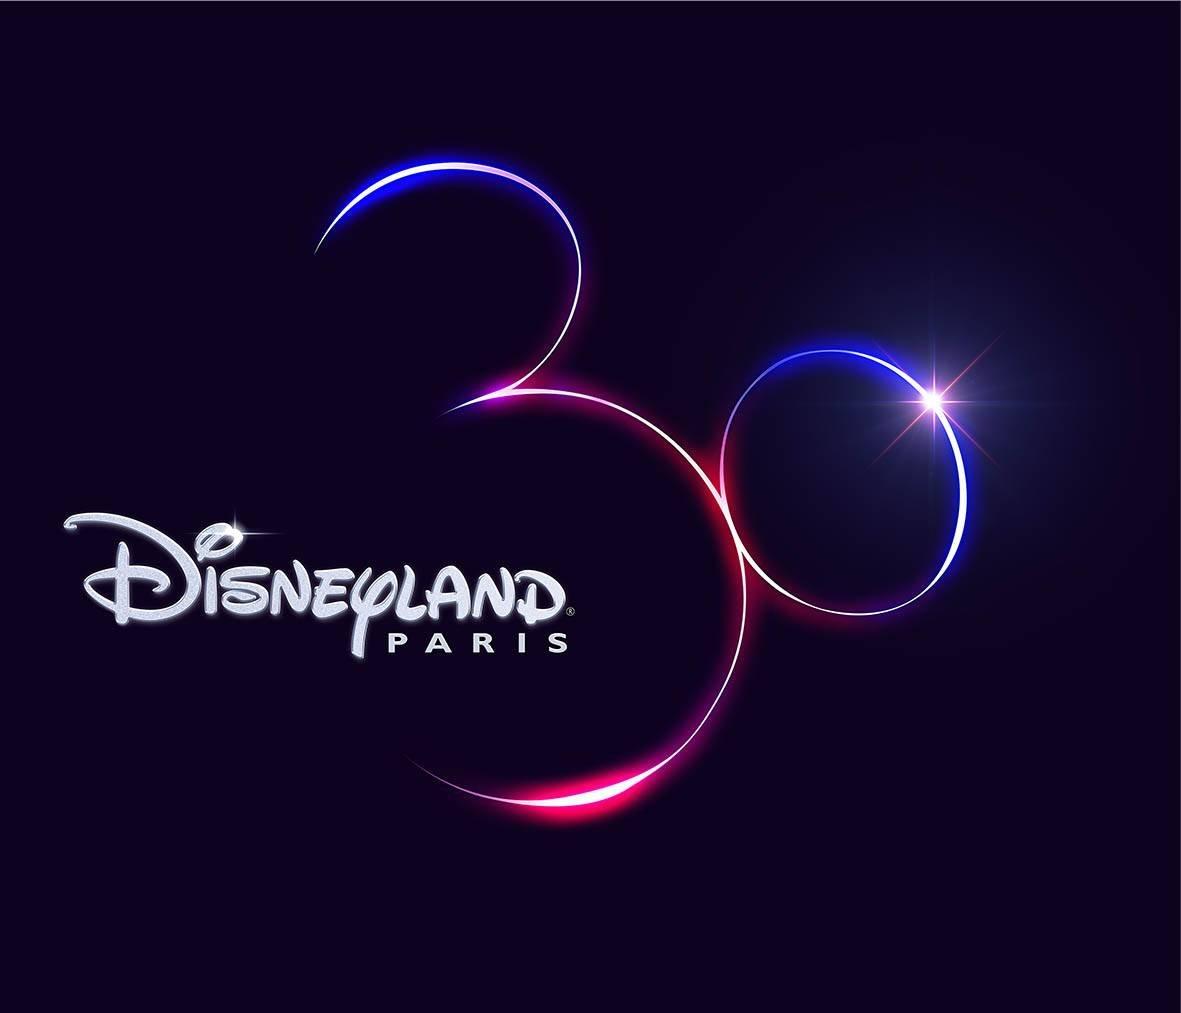 Disneyland Paris 2022 Logo